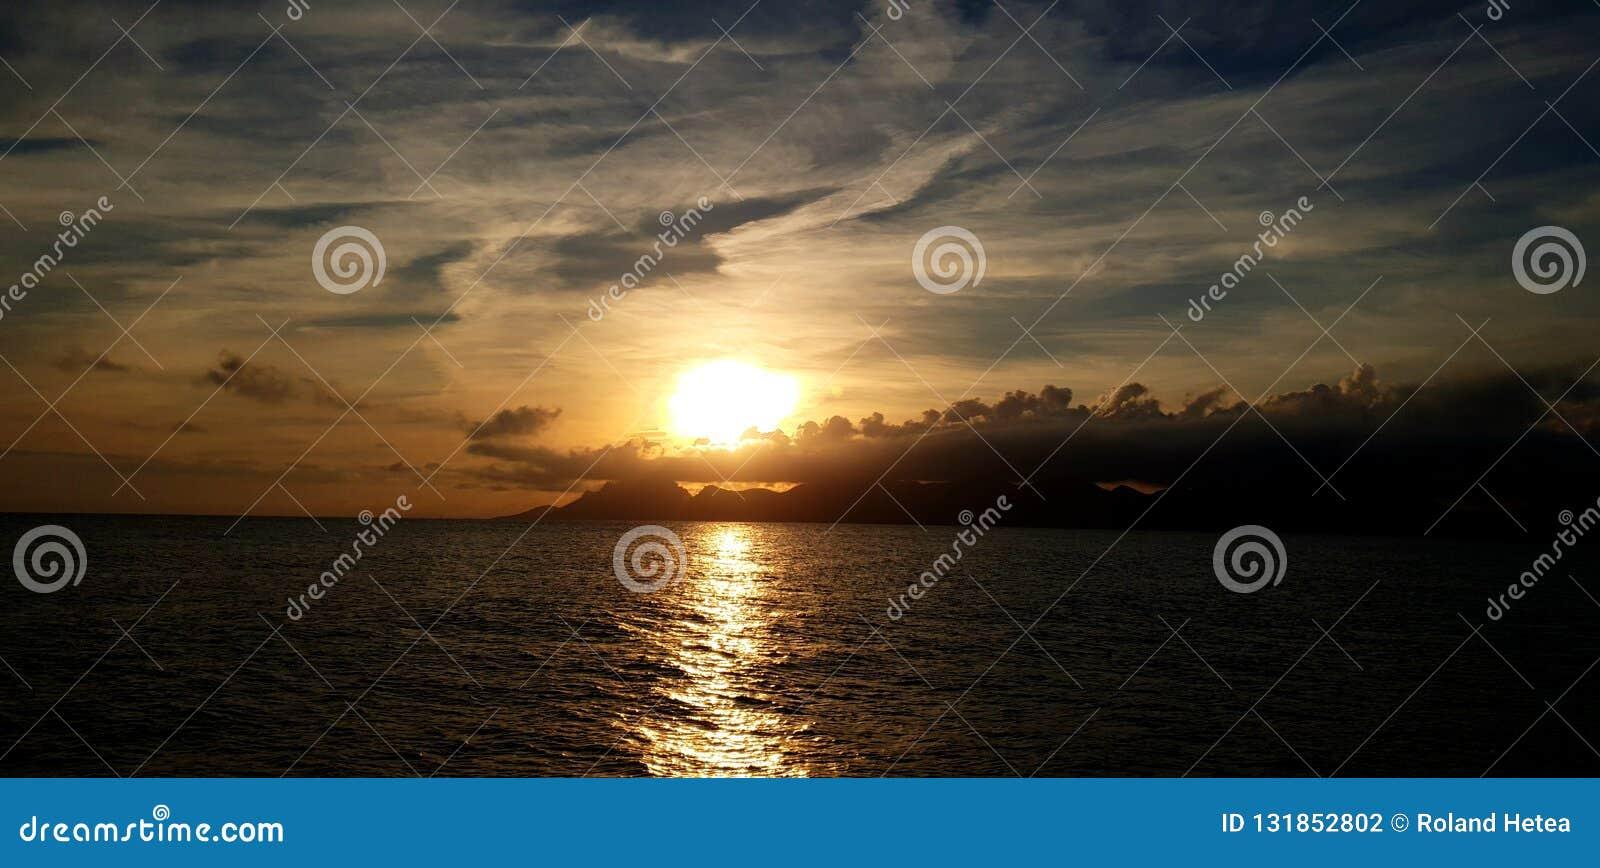 Sunset chills